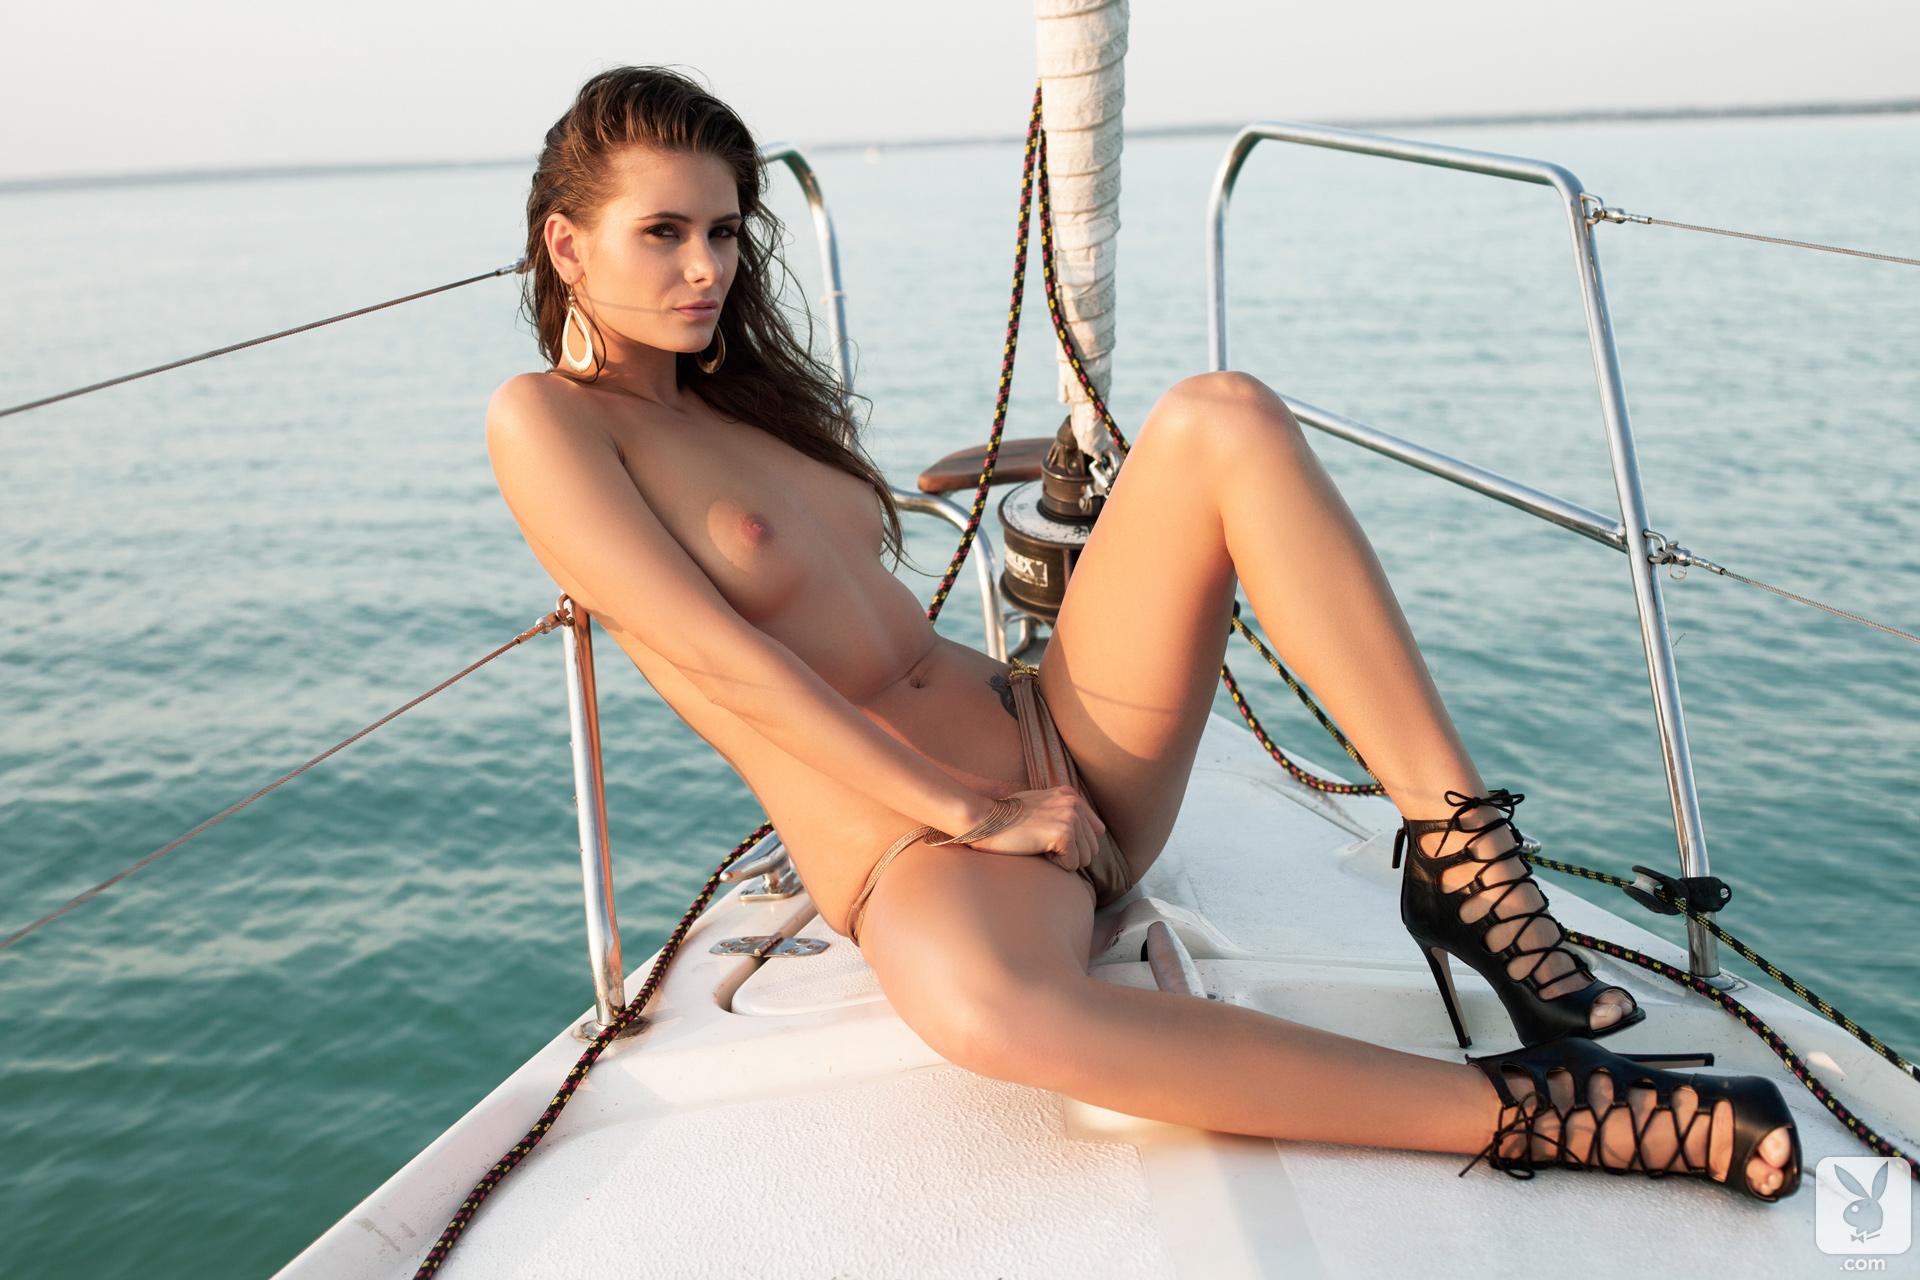 Naked On A Yacht